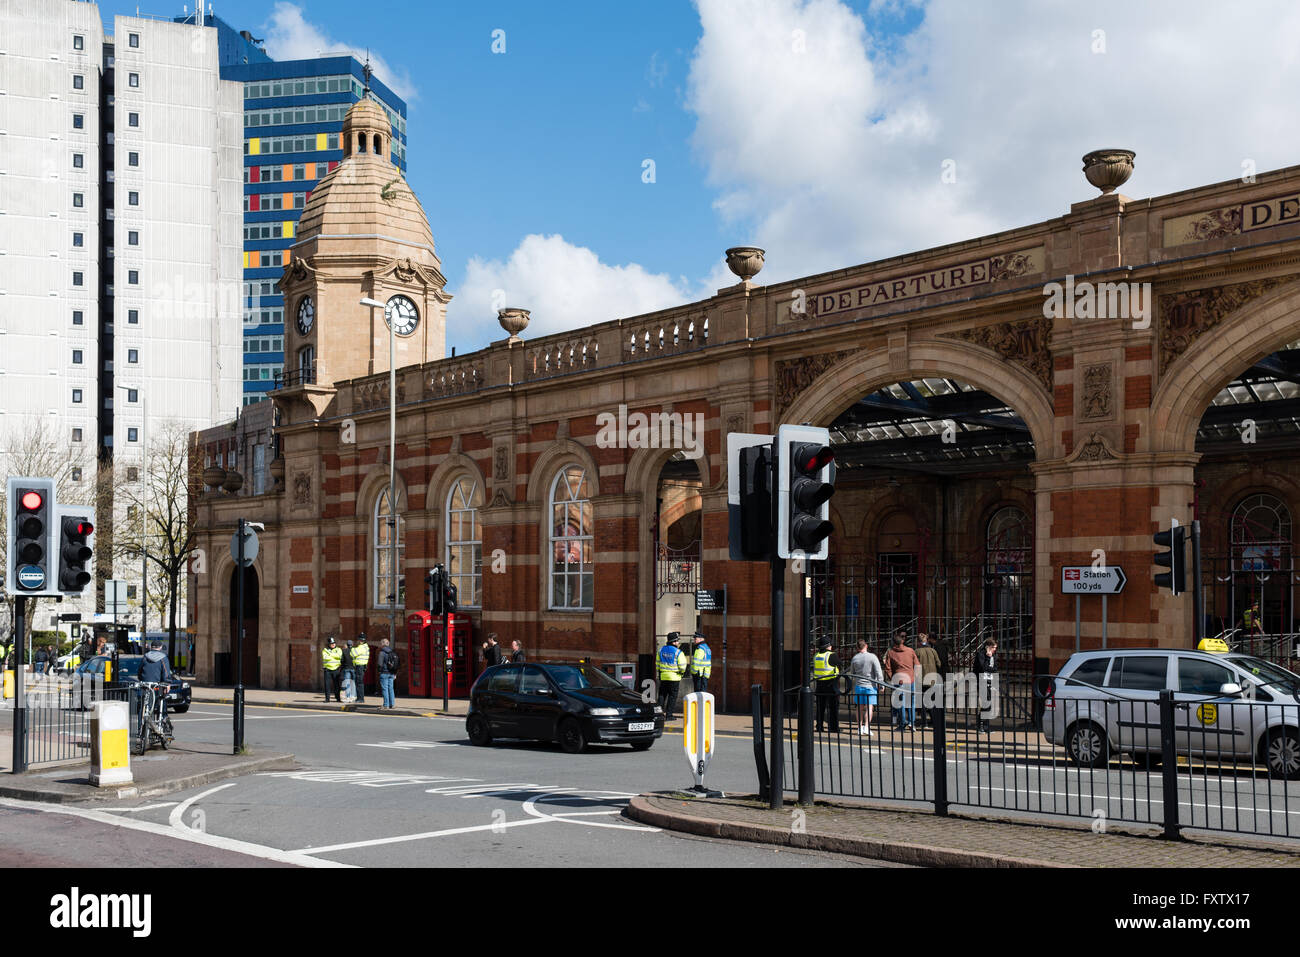 Leicester East Midlands Train Station,UK. - Stock Image